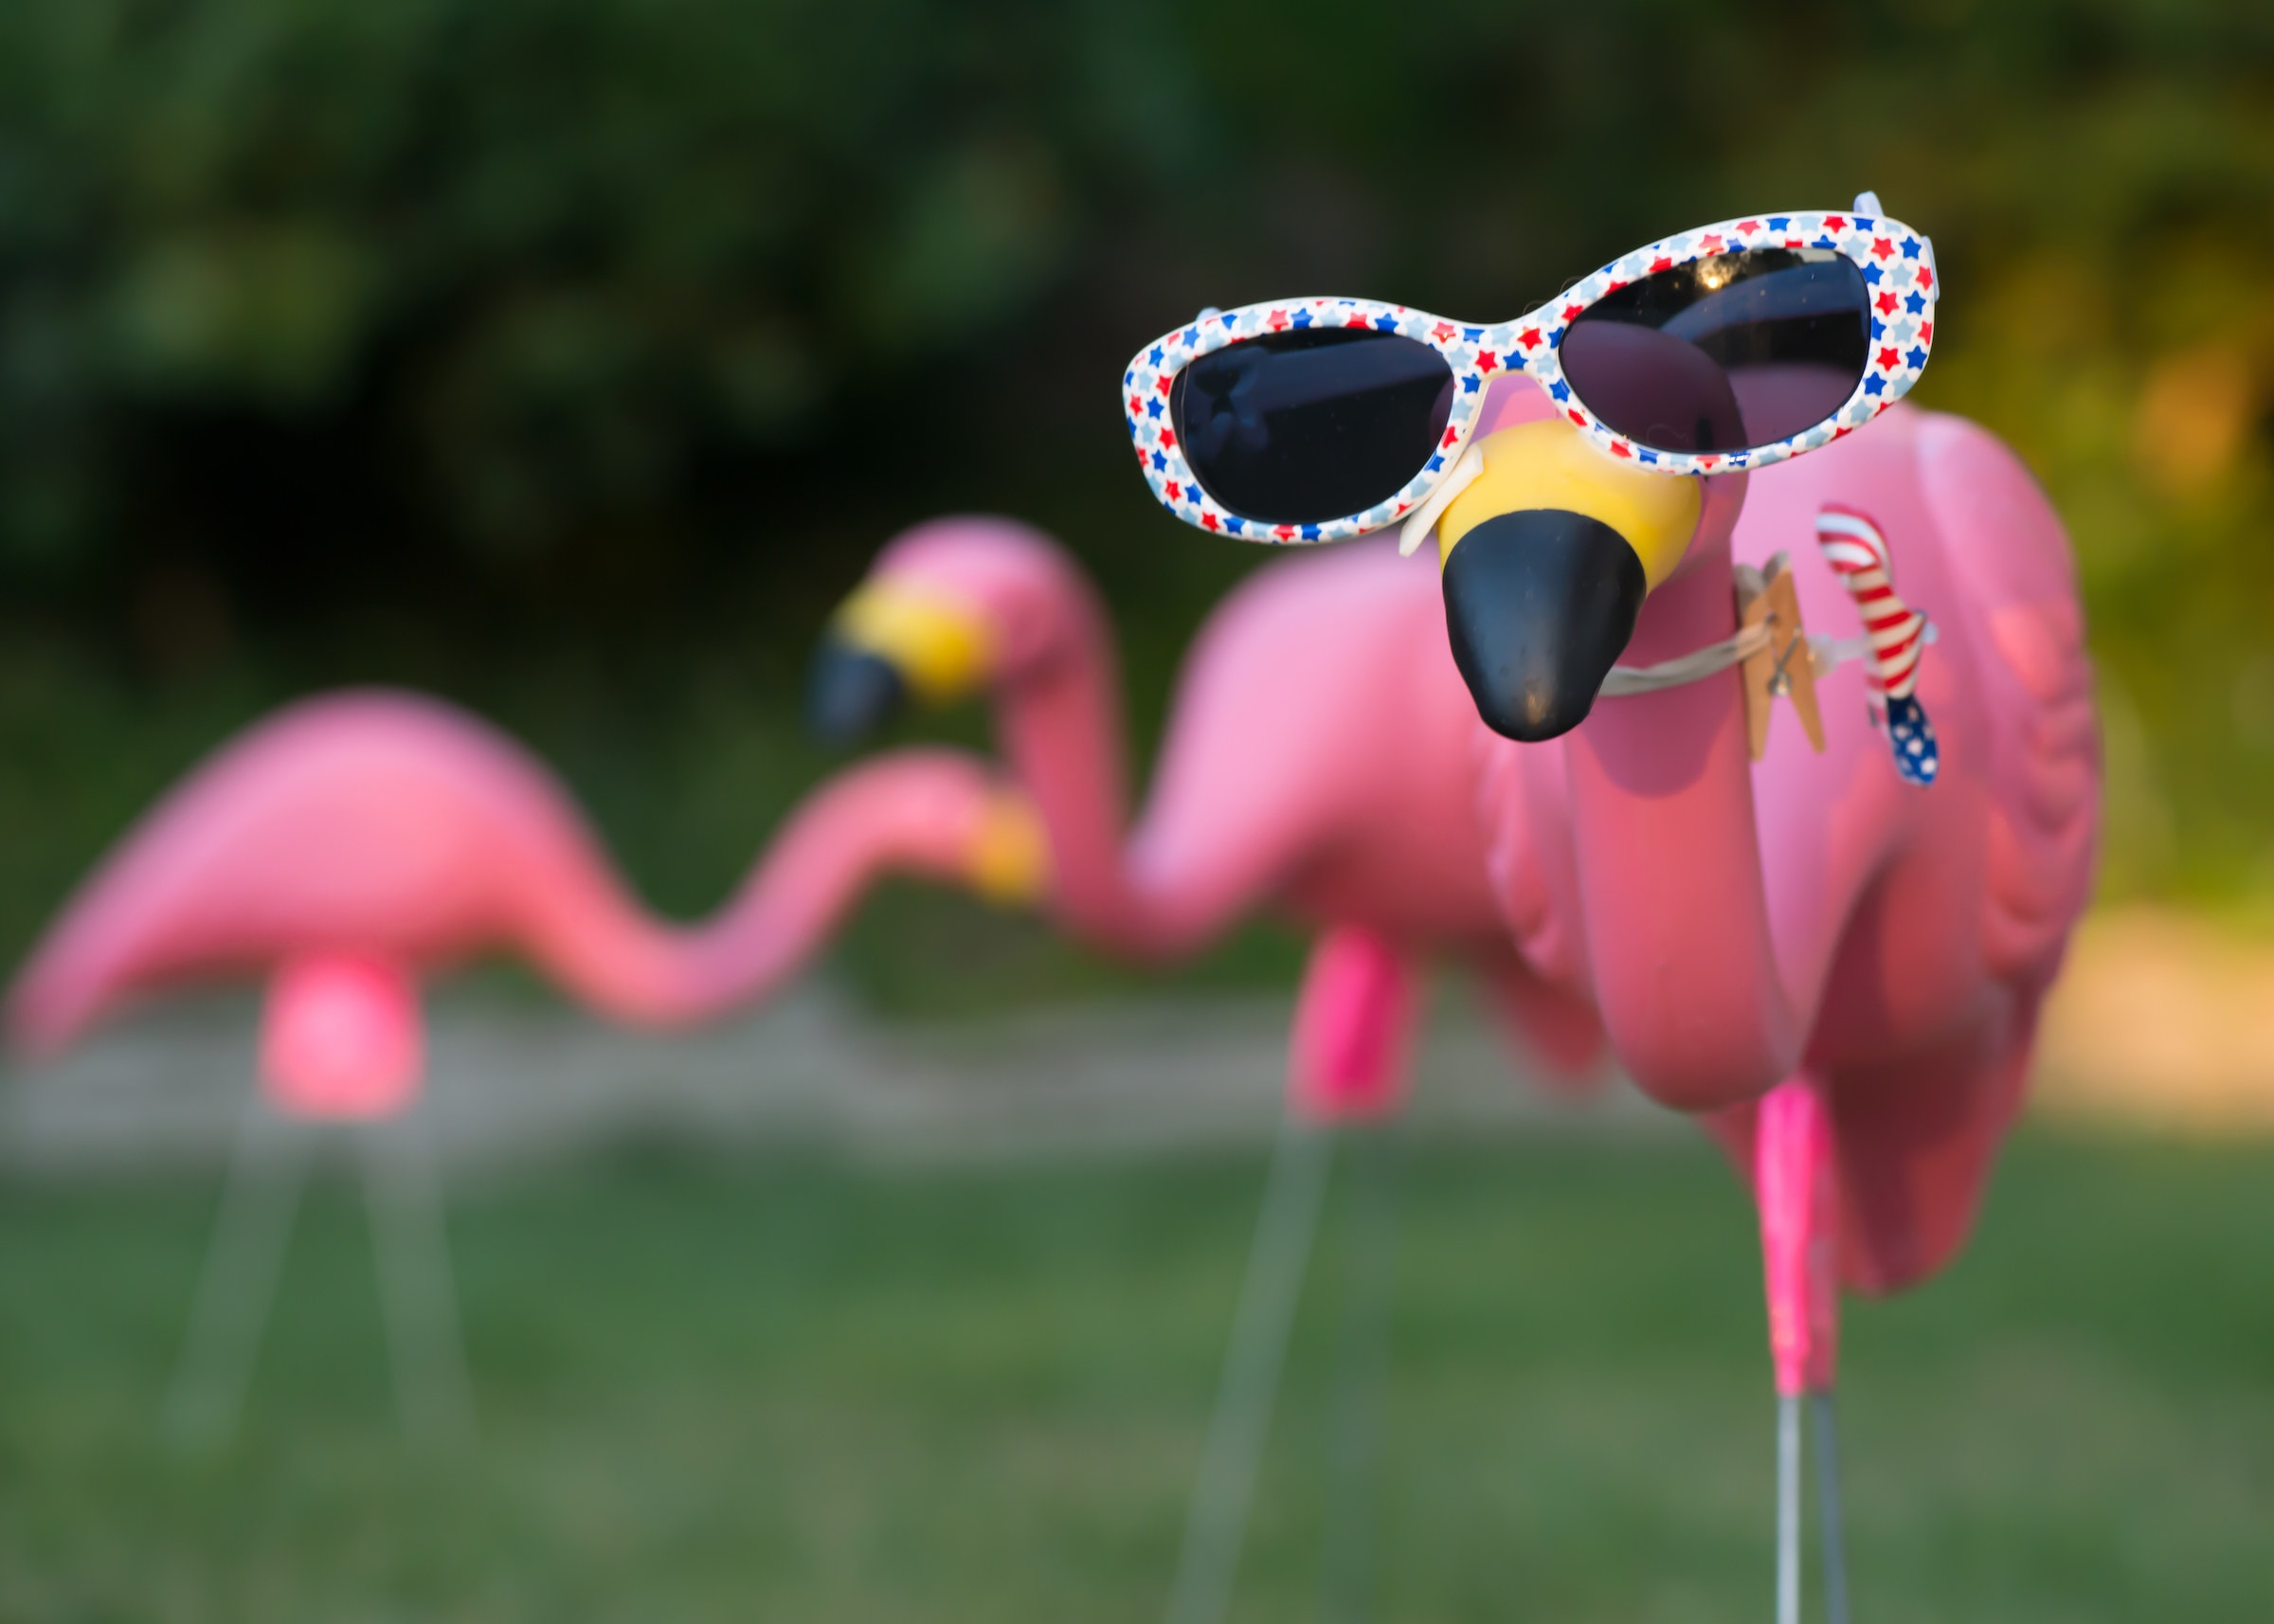 Three plastic lawn flamingos, one facing the camera has polka dotted sunglasses